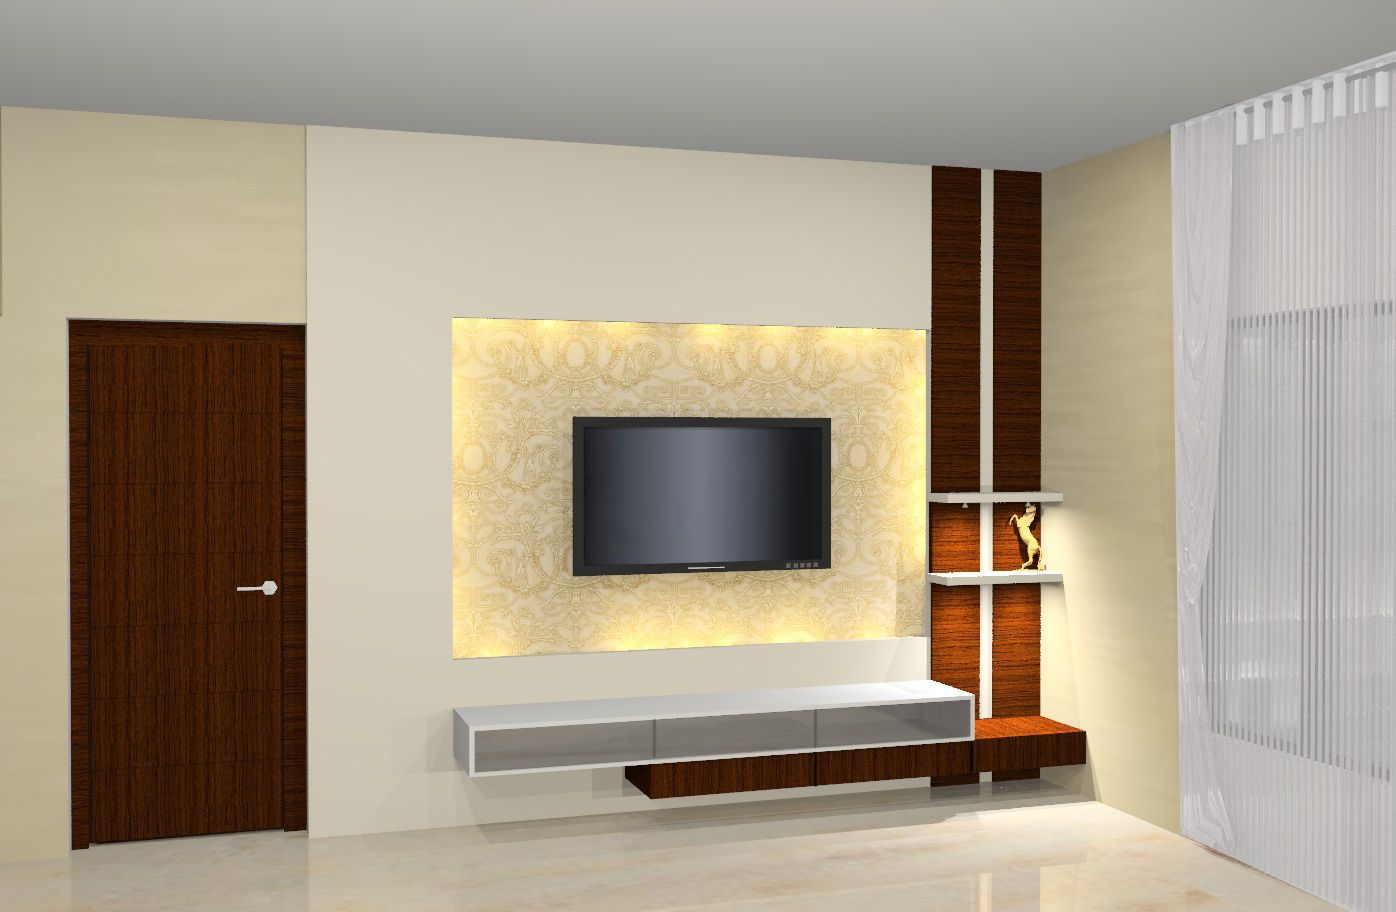 Tv Unit Designs For Living Room Rustic Decor T V Upper Family Families Un More